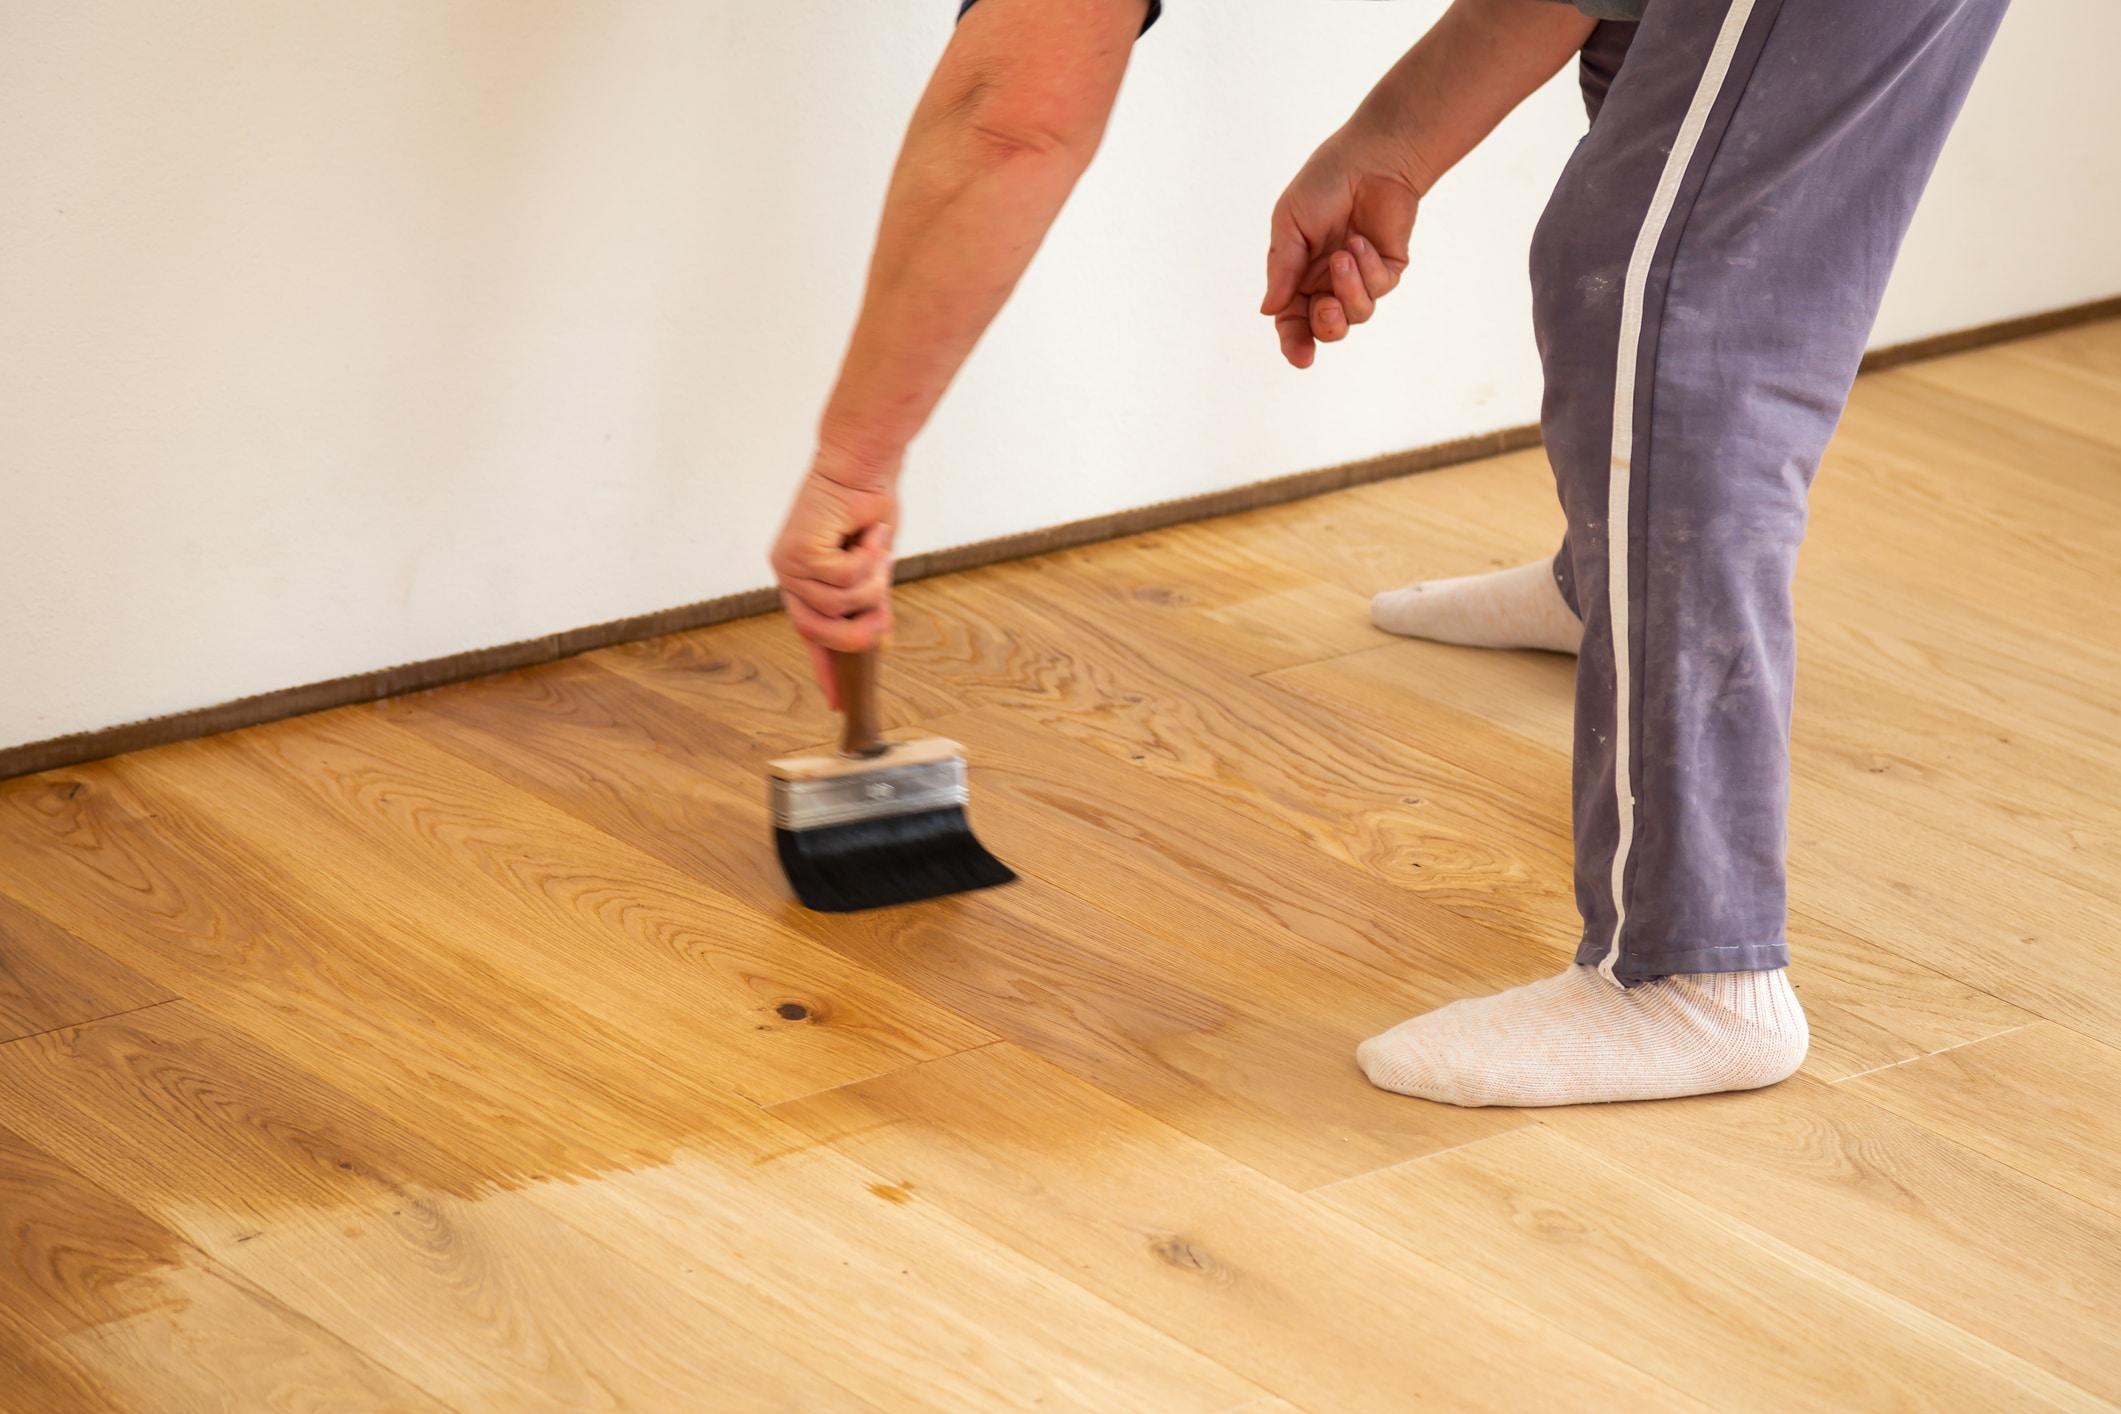 Oil Versus Water Based Floor Finish